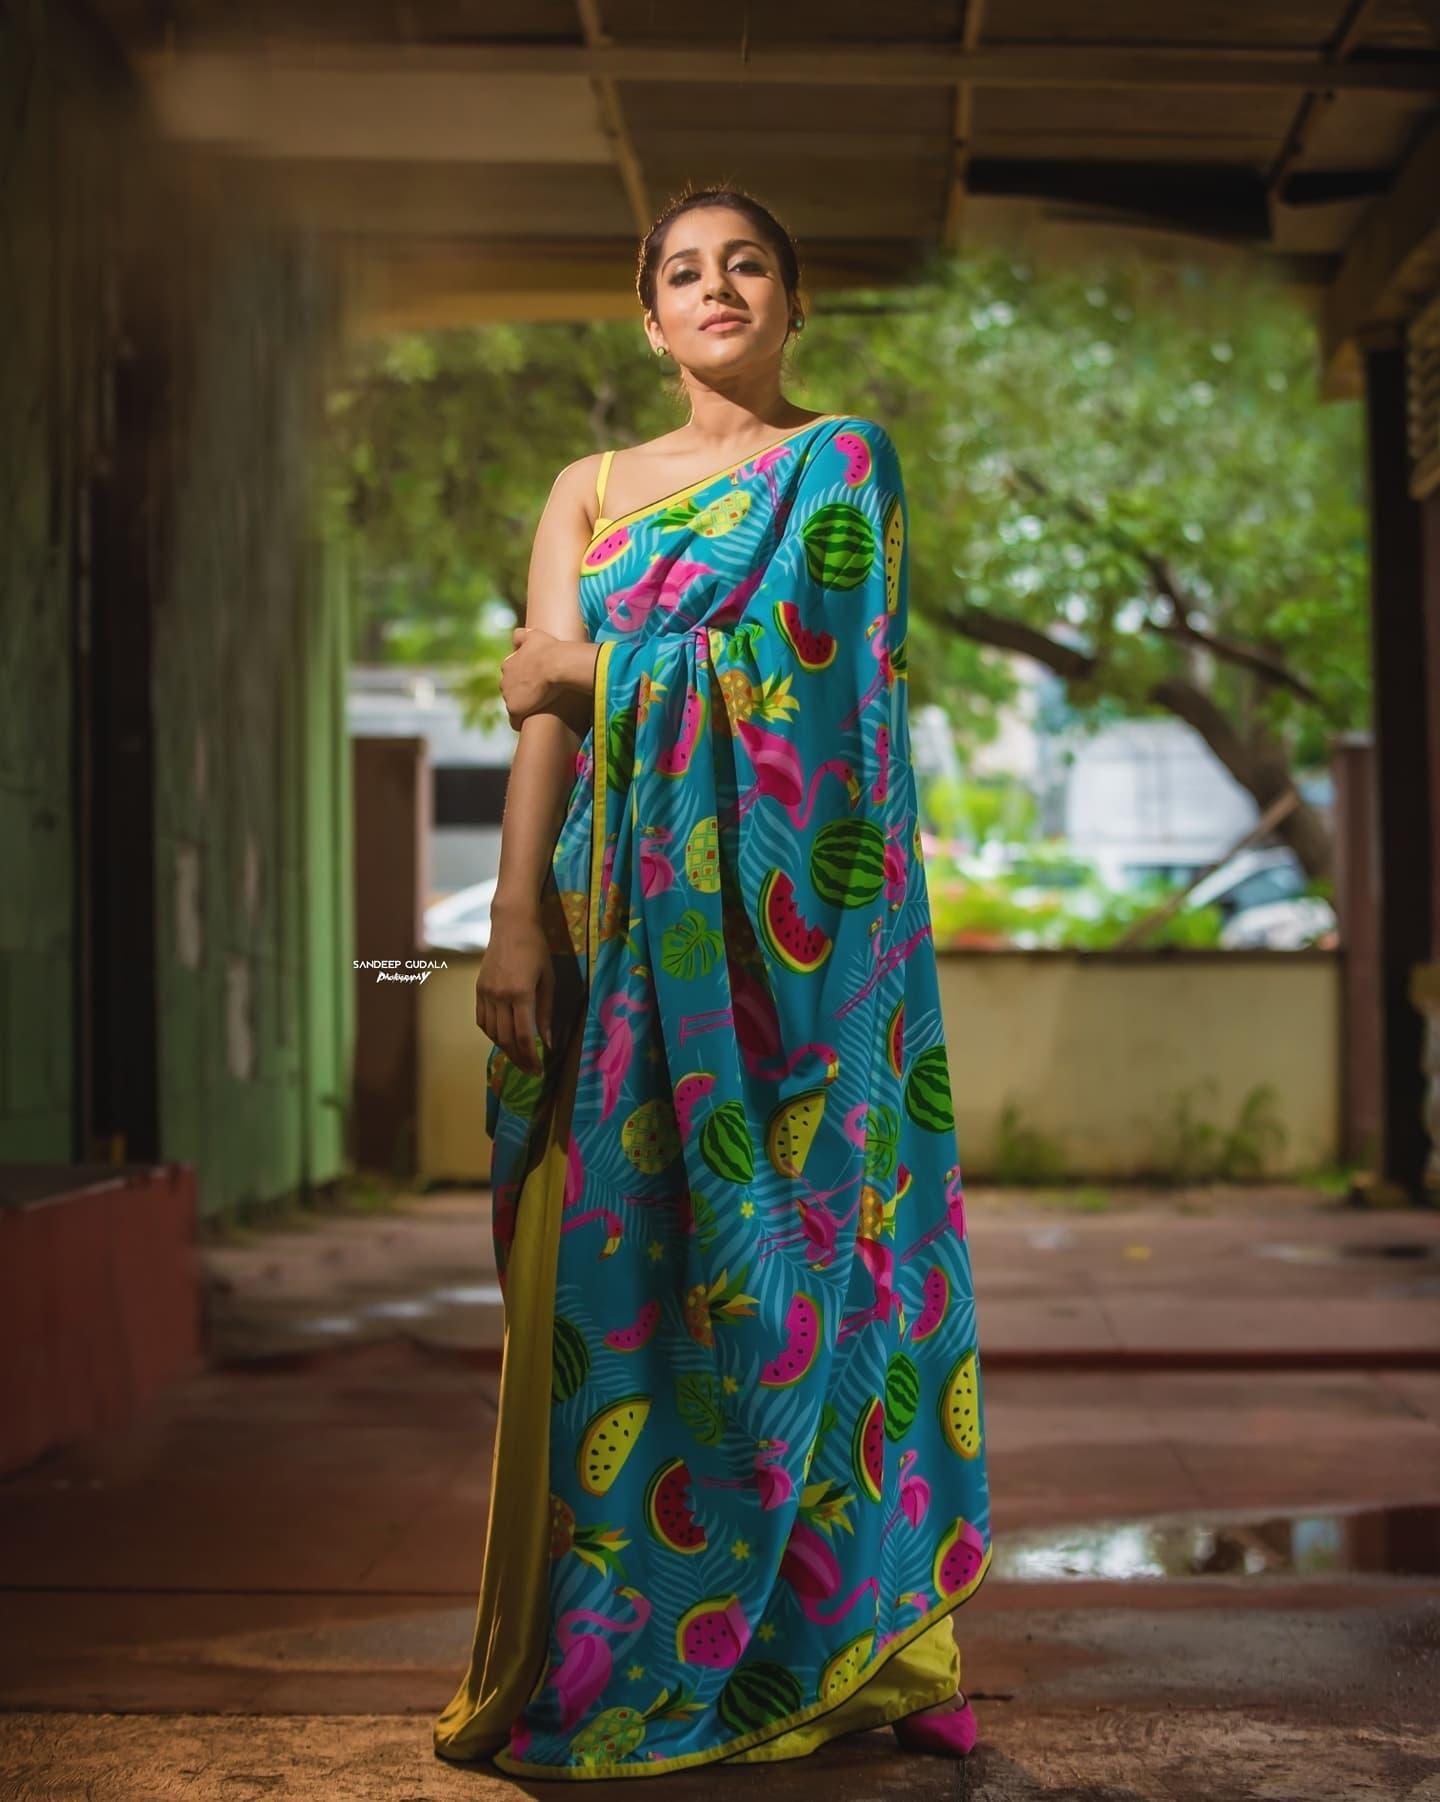 Beautiful actress Rashmi Gautham in Flemingo print saree for jabardasth. Saree by Shrutiig clothing . 2021-09-25